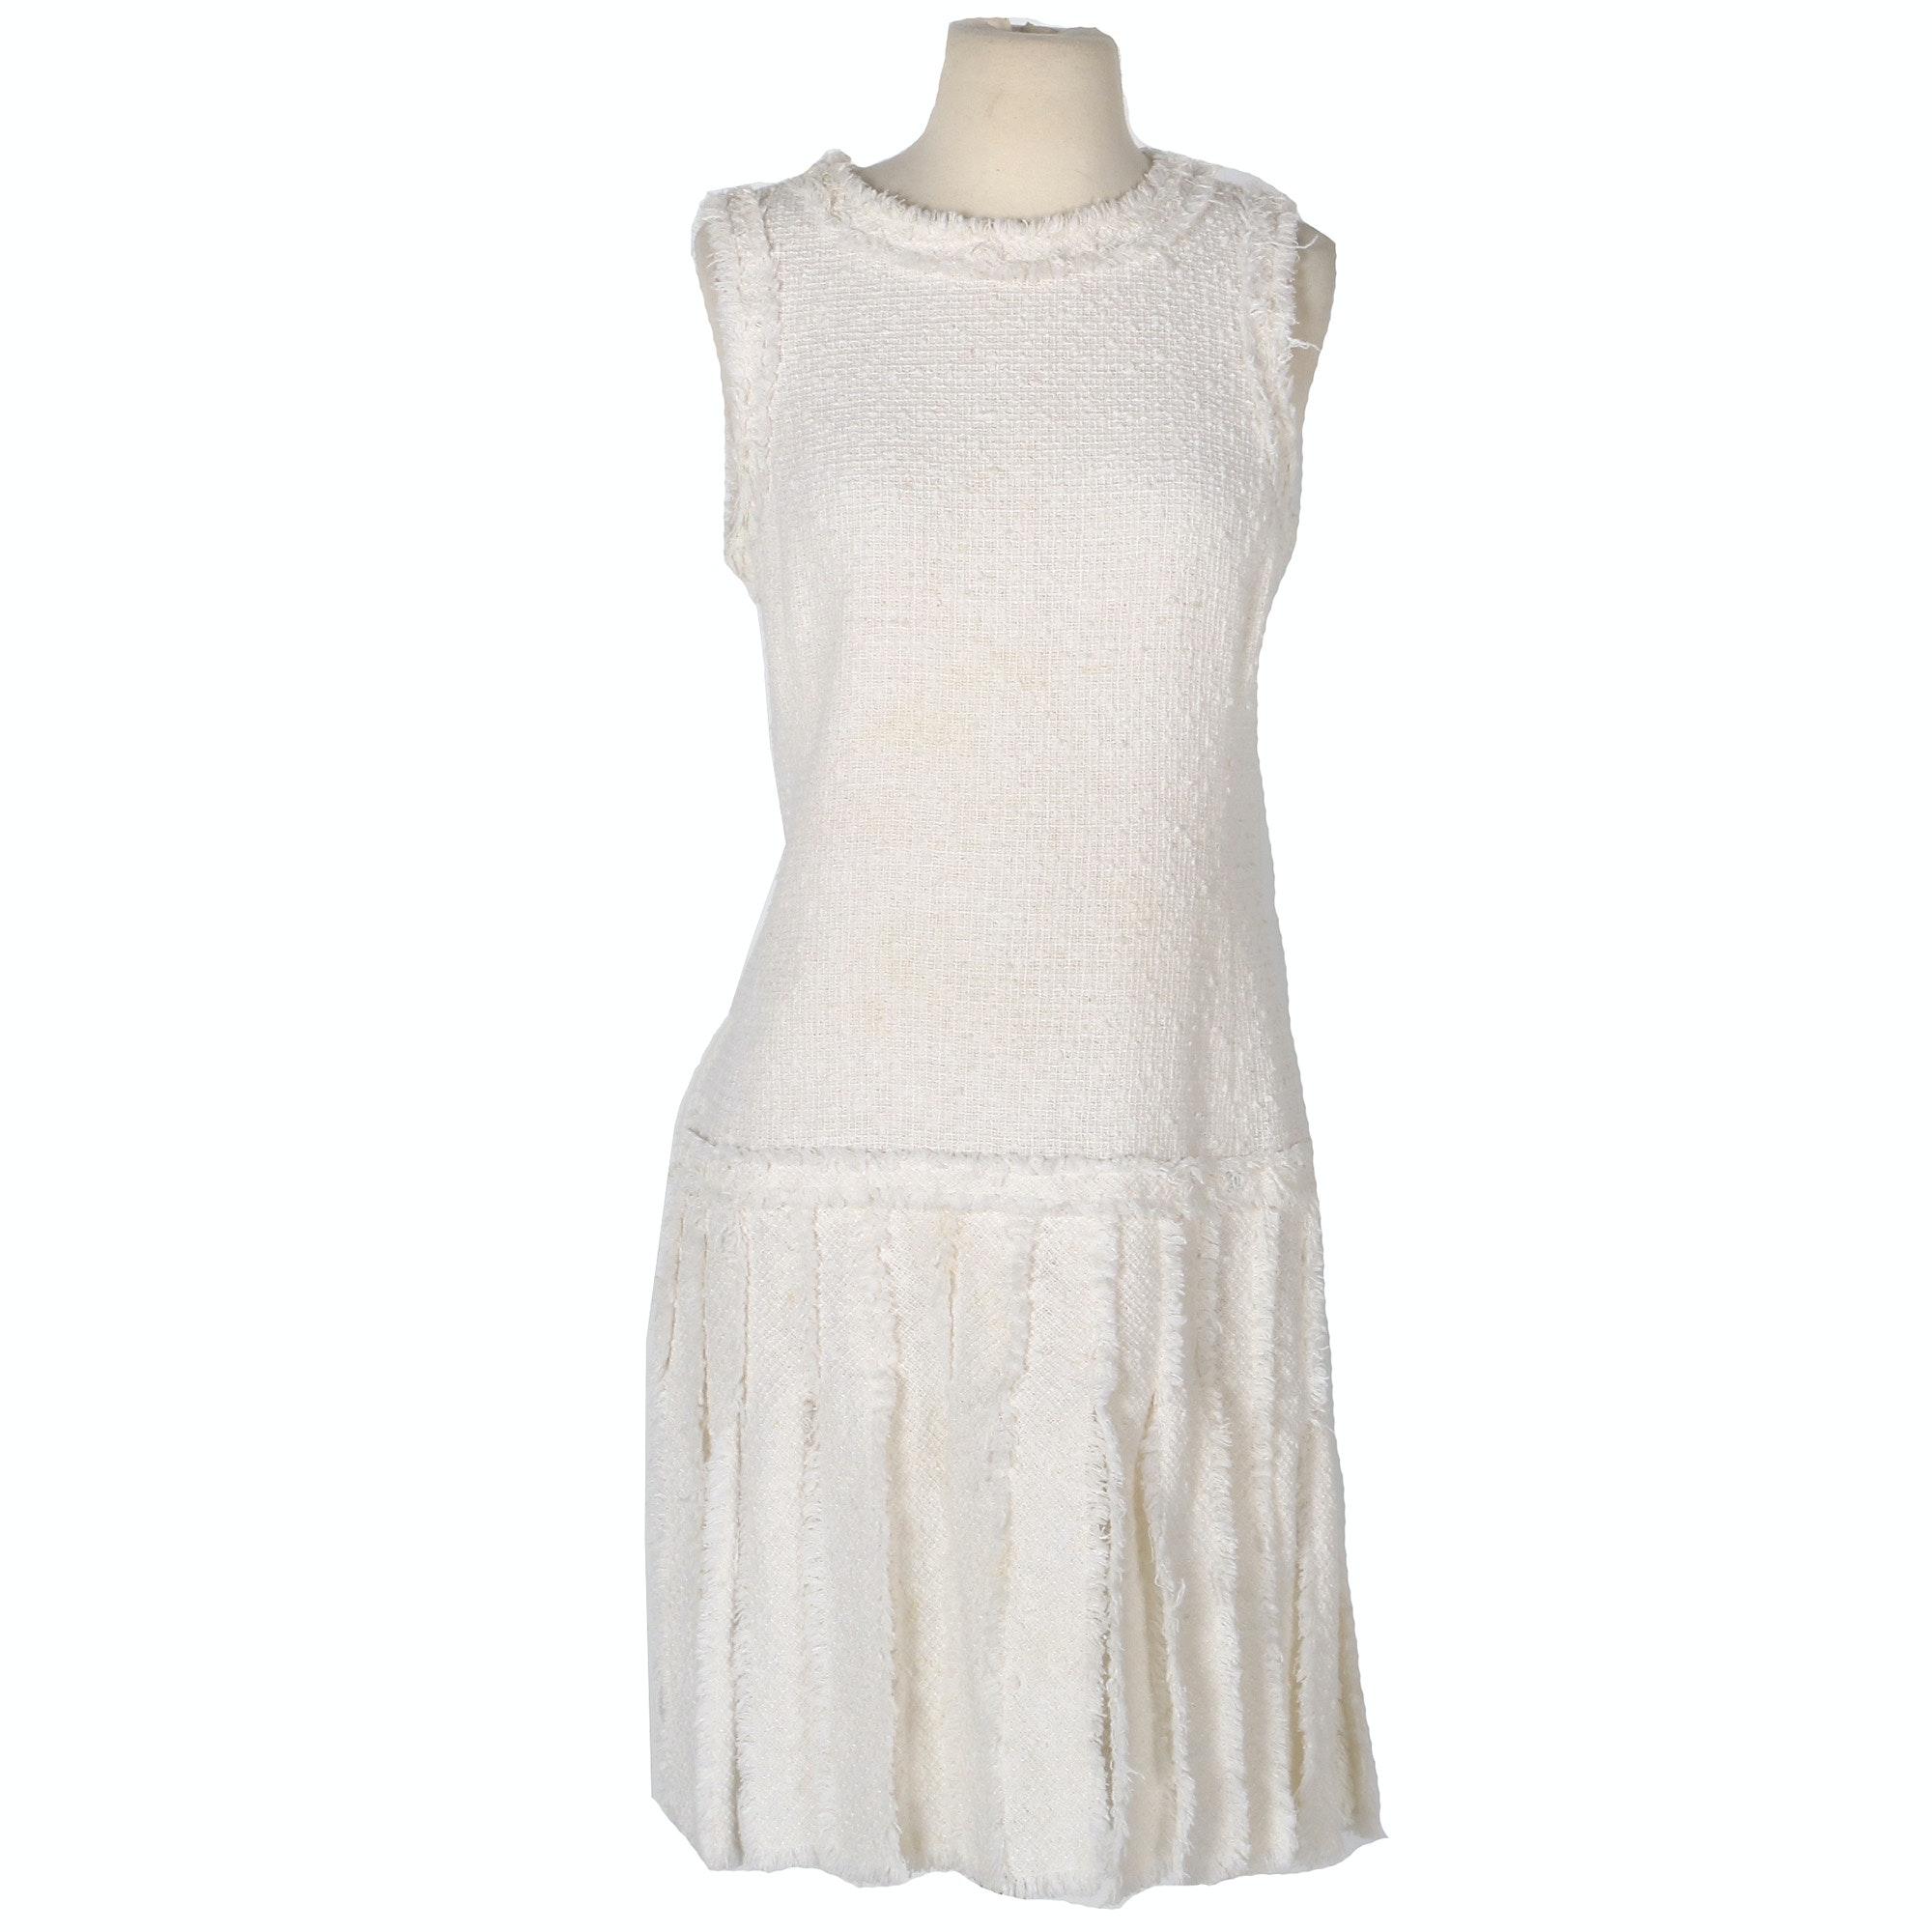 Chanel Cream Tweed Fringe Dress